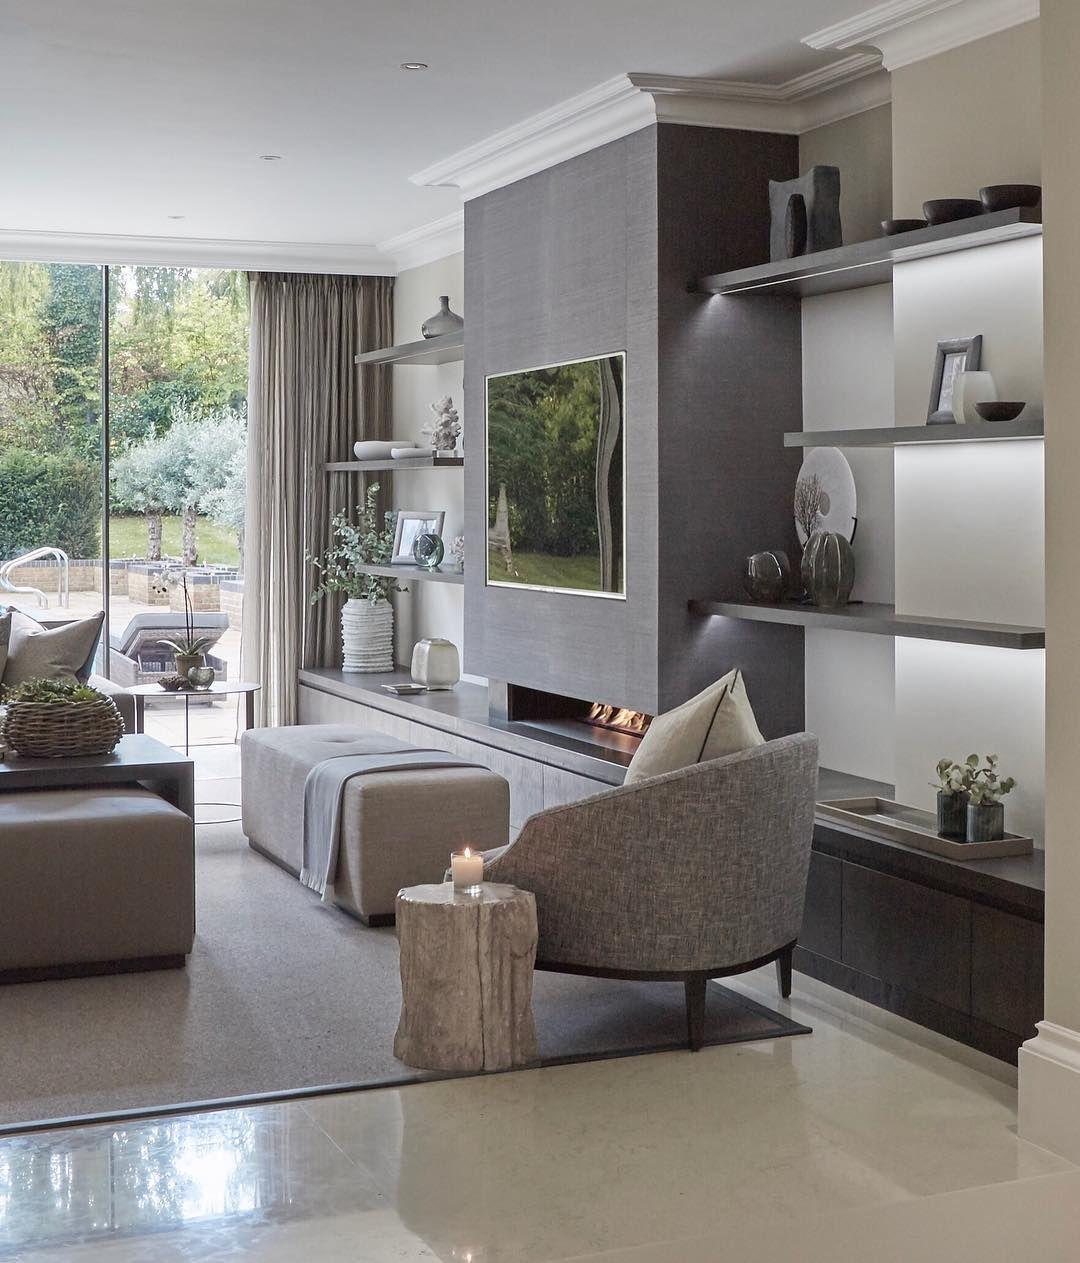 30+ Minimalist Living Room Ideas & Inspiration to Make the